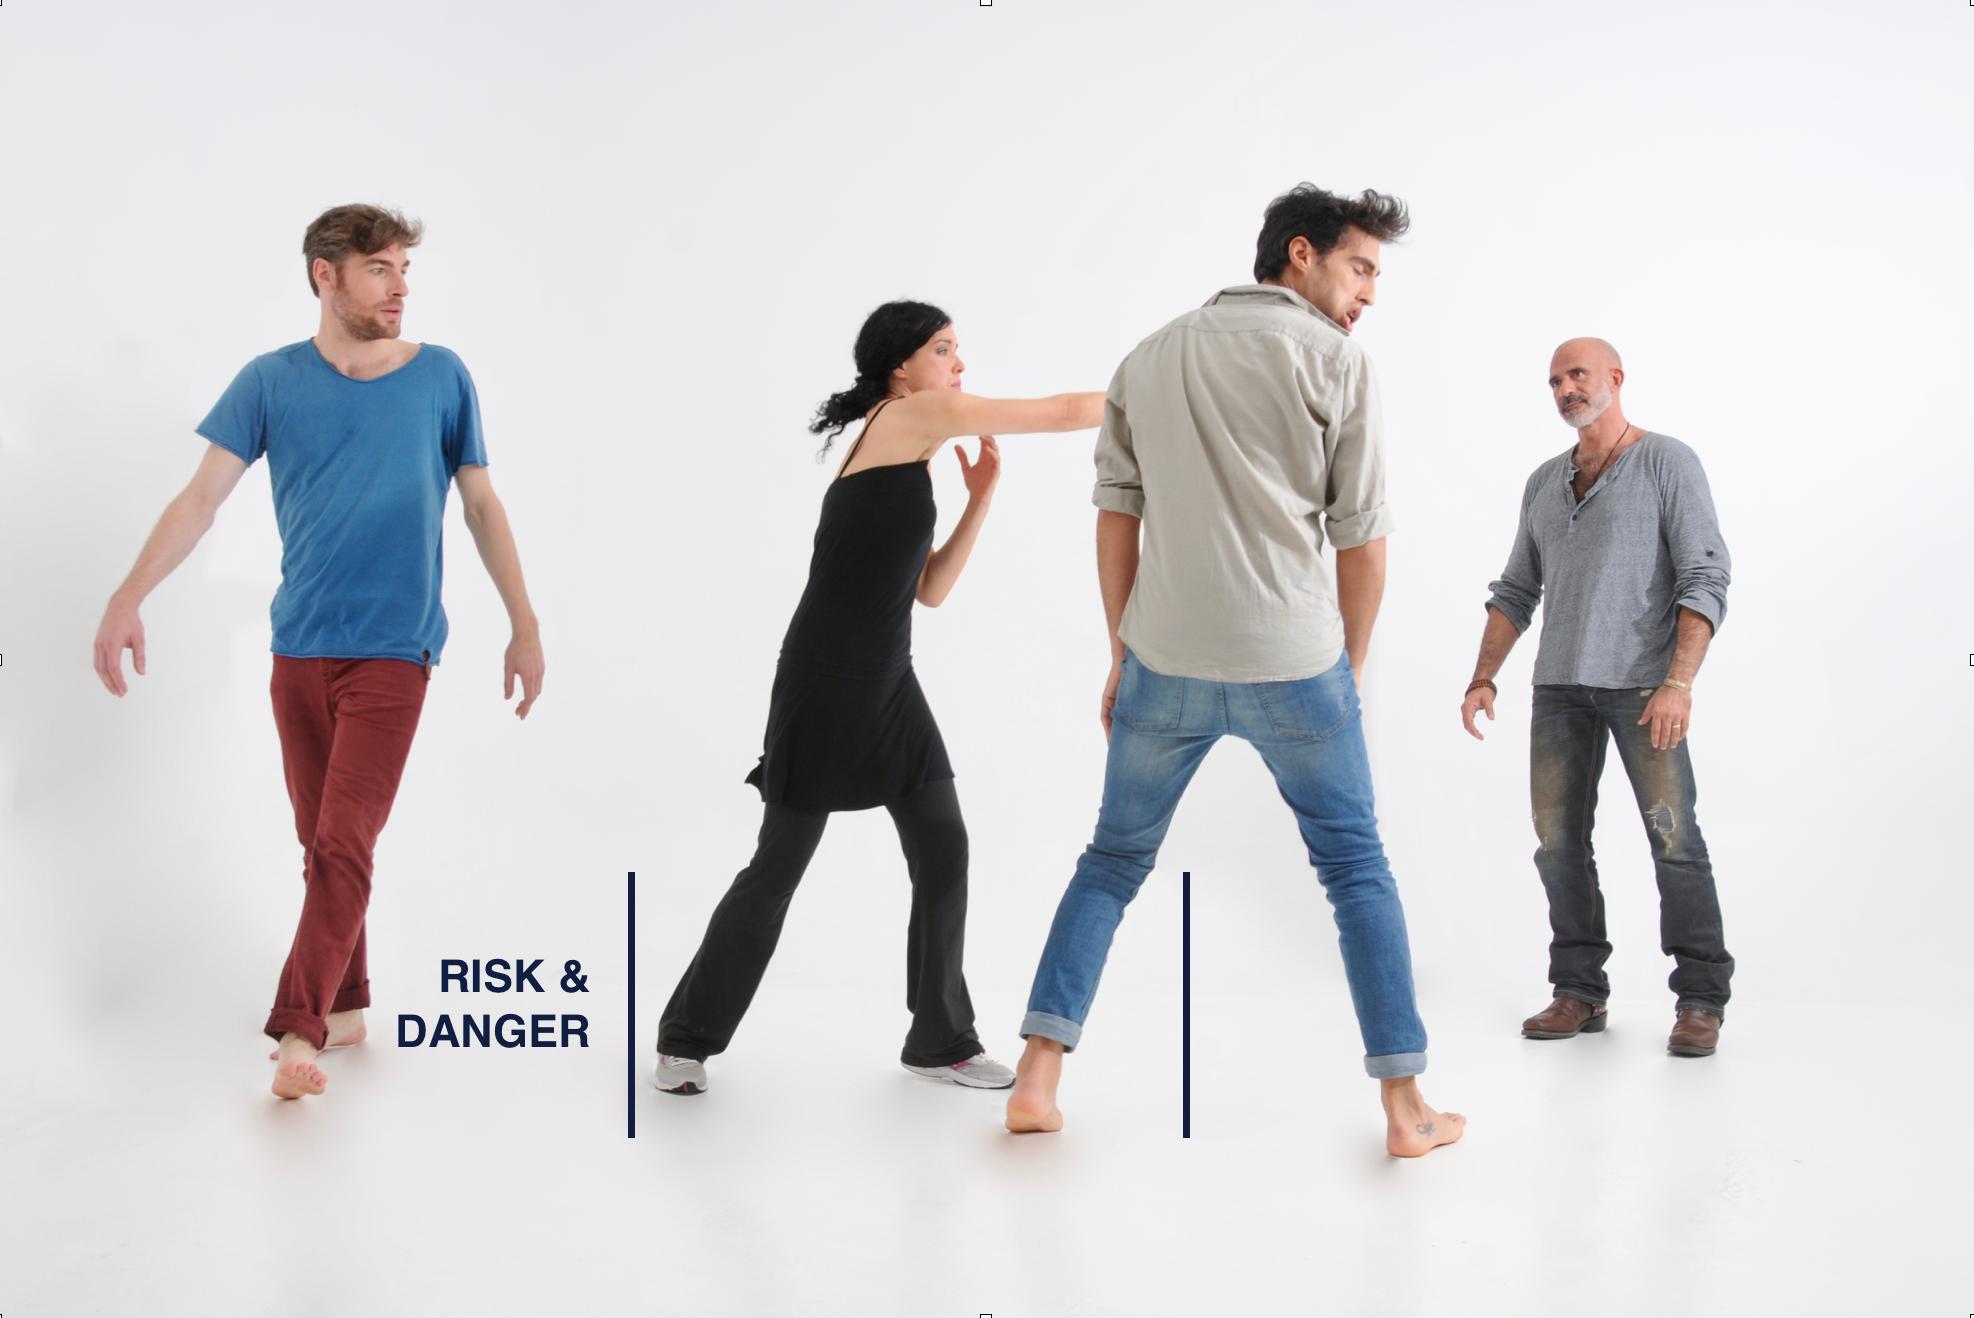 Curso de risk & danger - Tecnica Meisner para actores